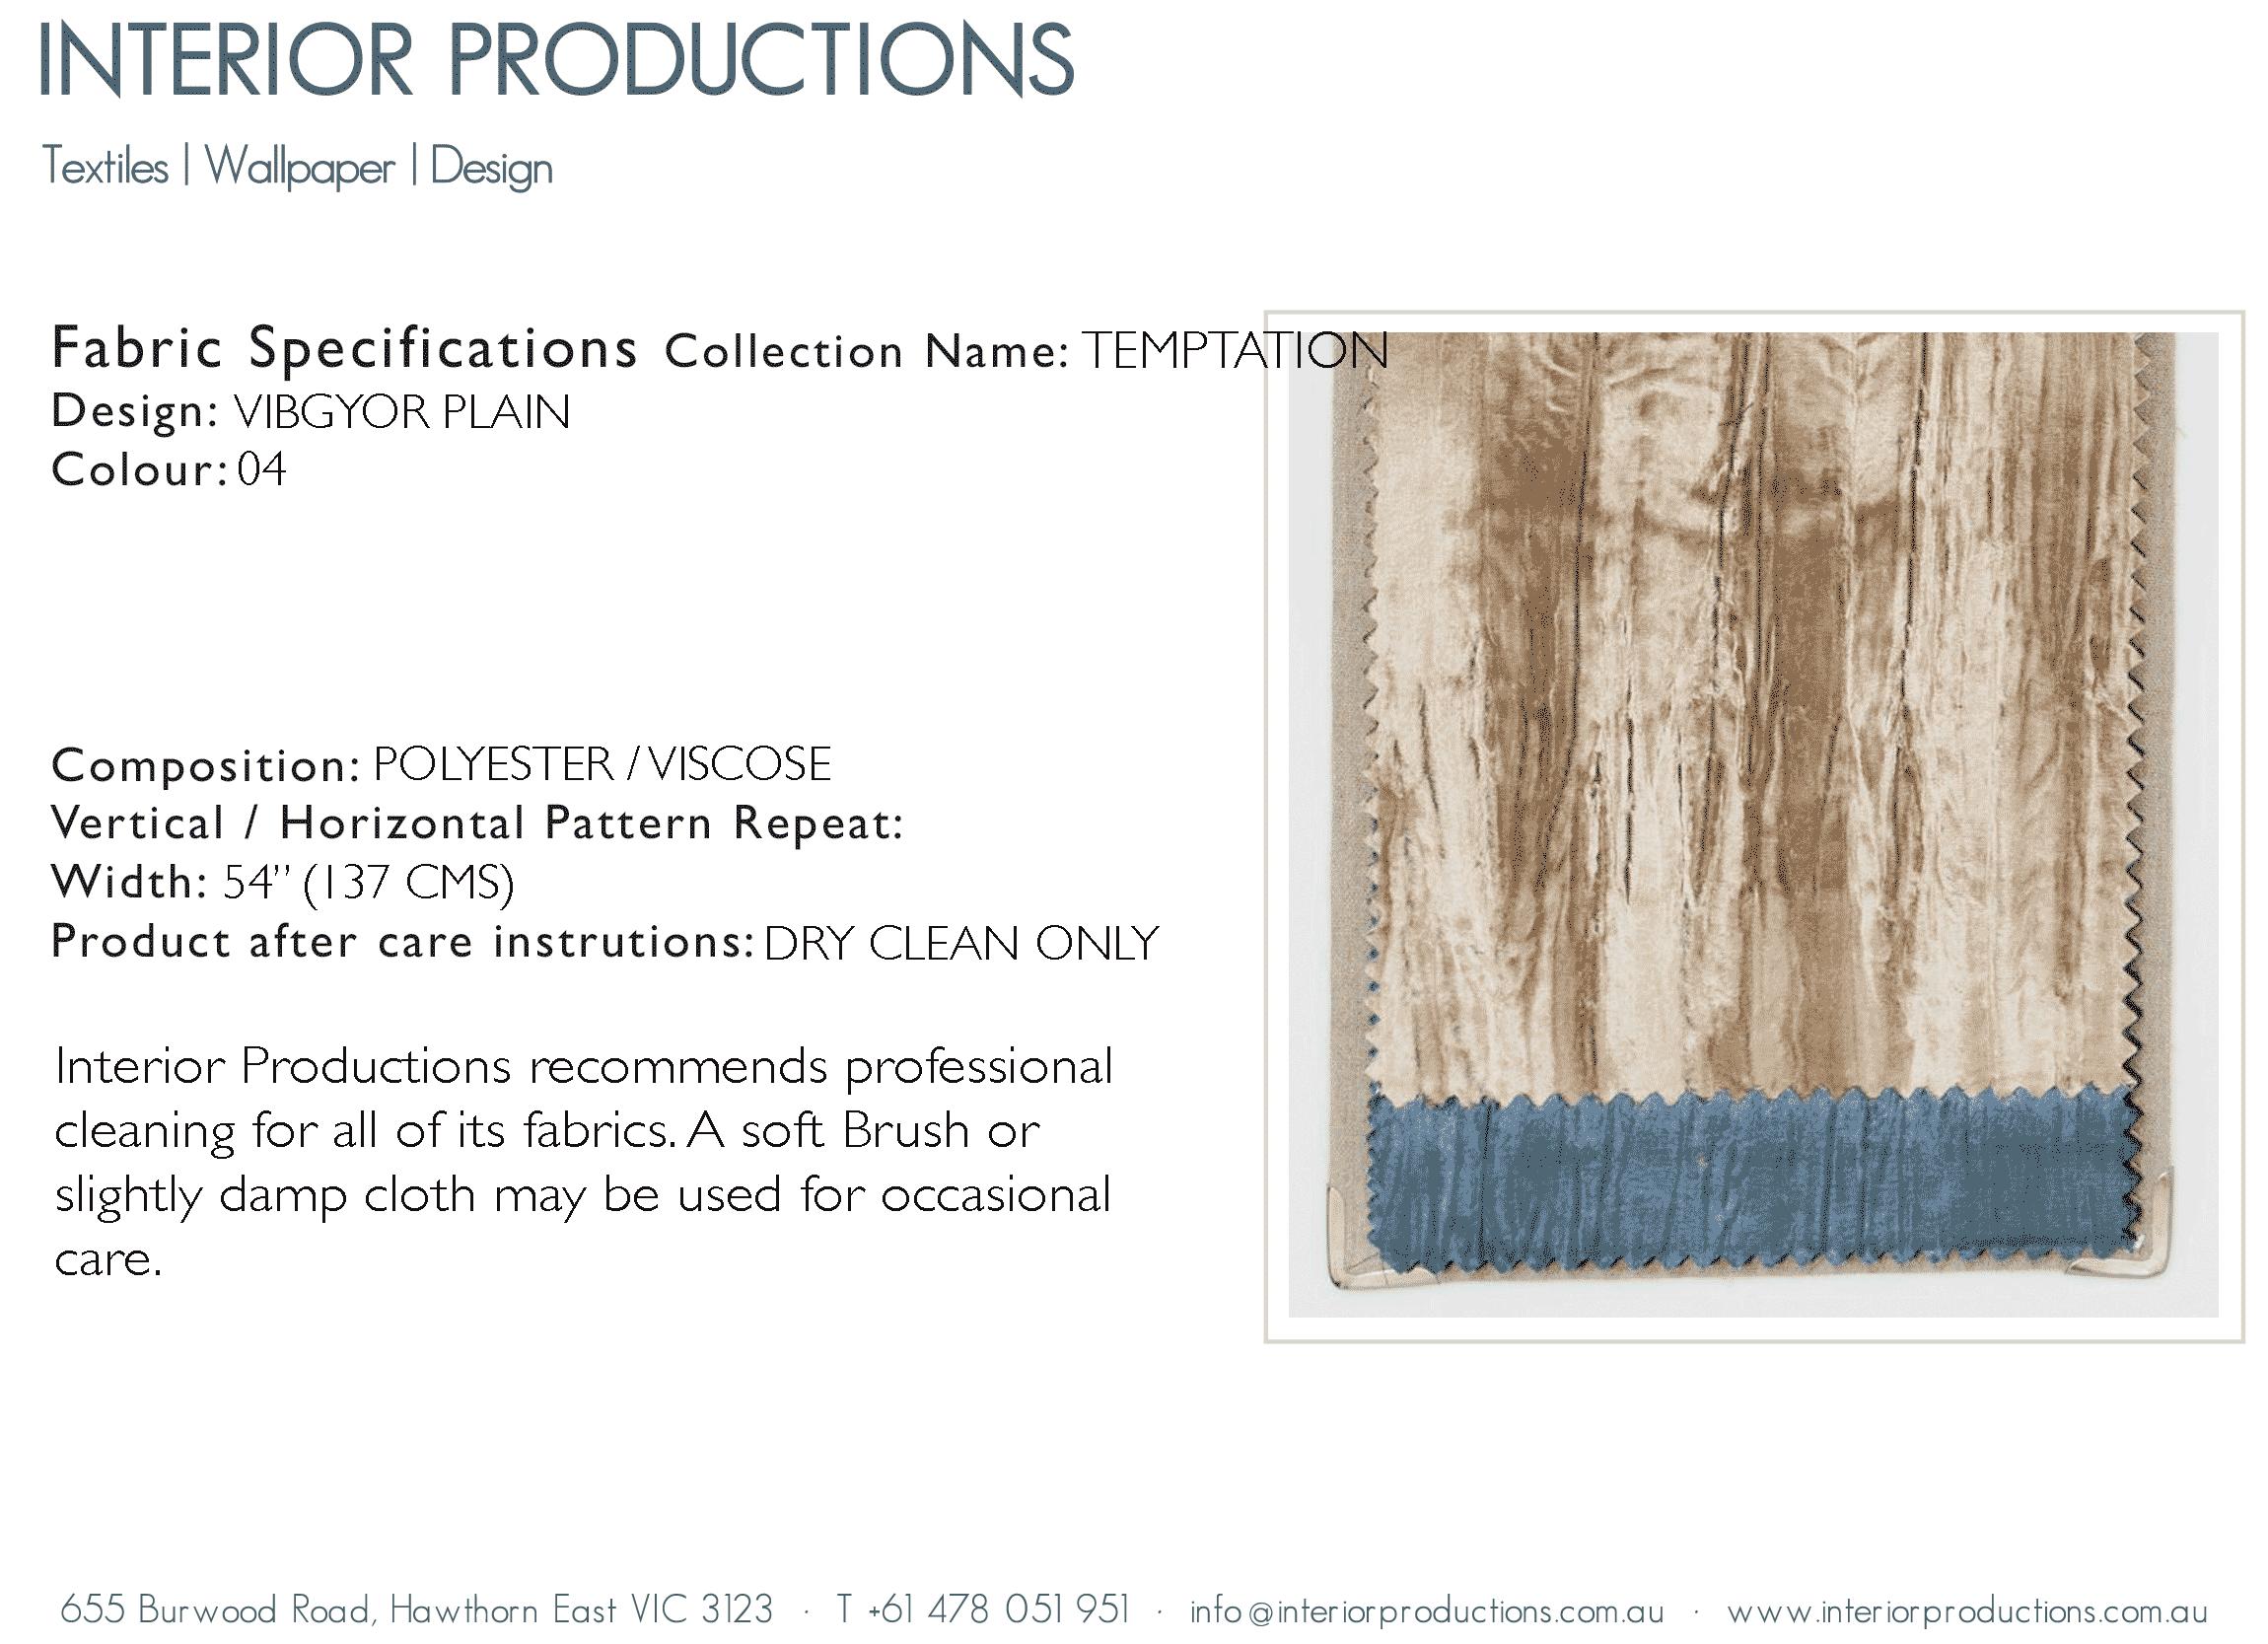 interior_productions_VIBGYOR-PLAIN---04